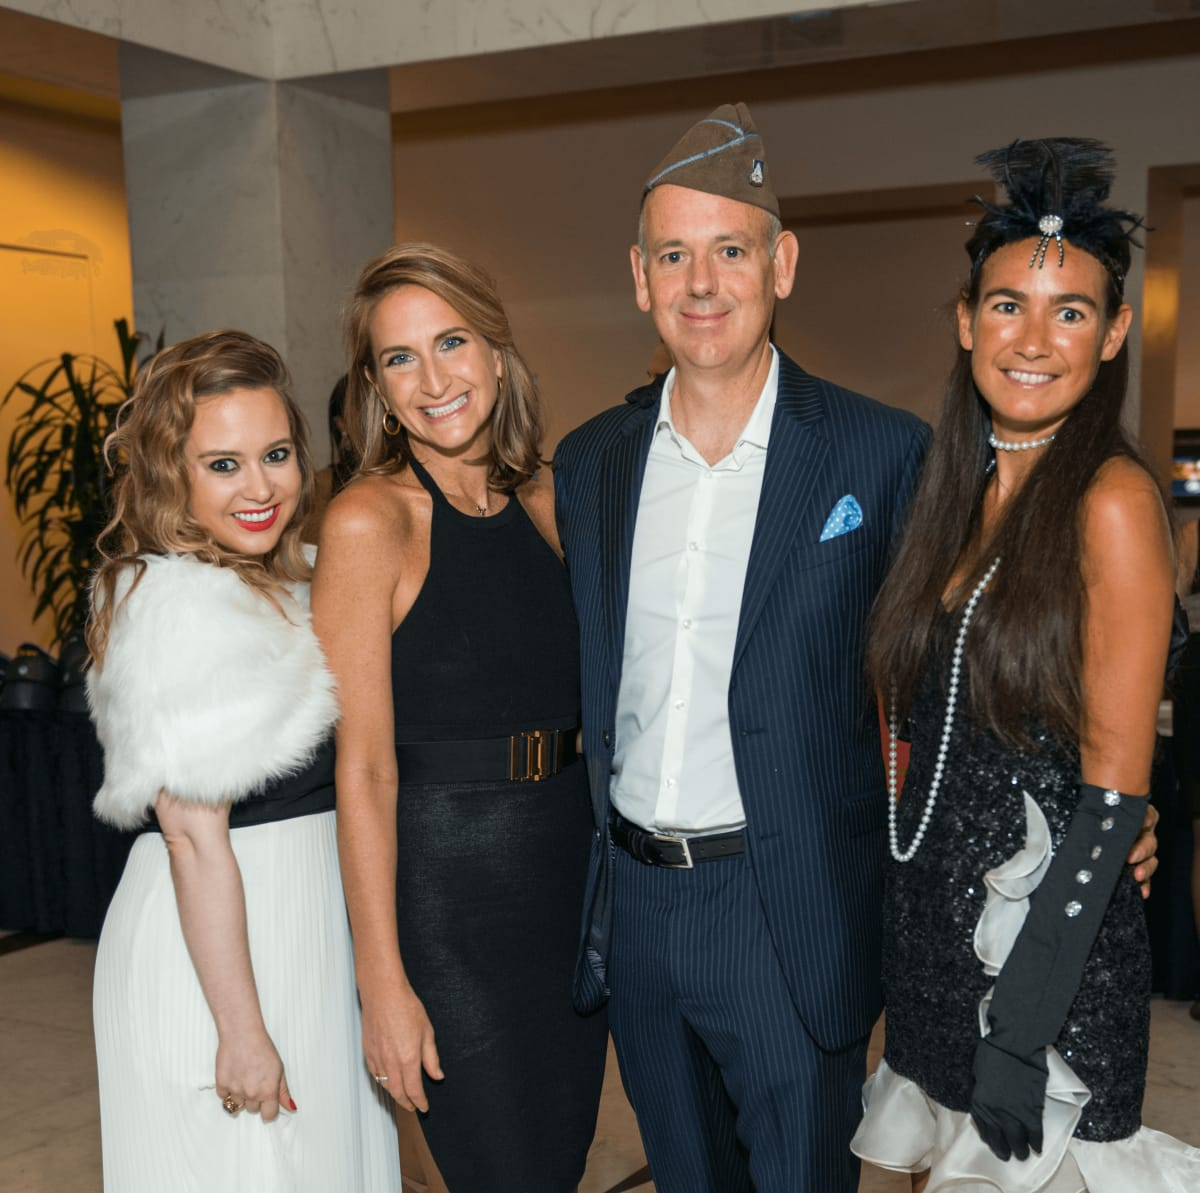 Megan Blaisdell, Sarah Hartland, Maston Allen, Anne Burgot at Mission of Yahweh gala